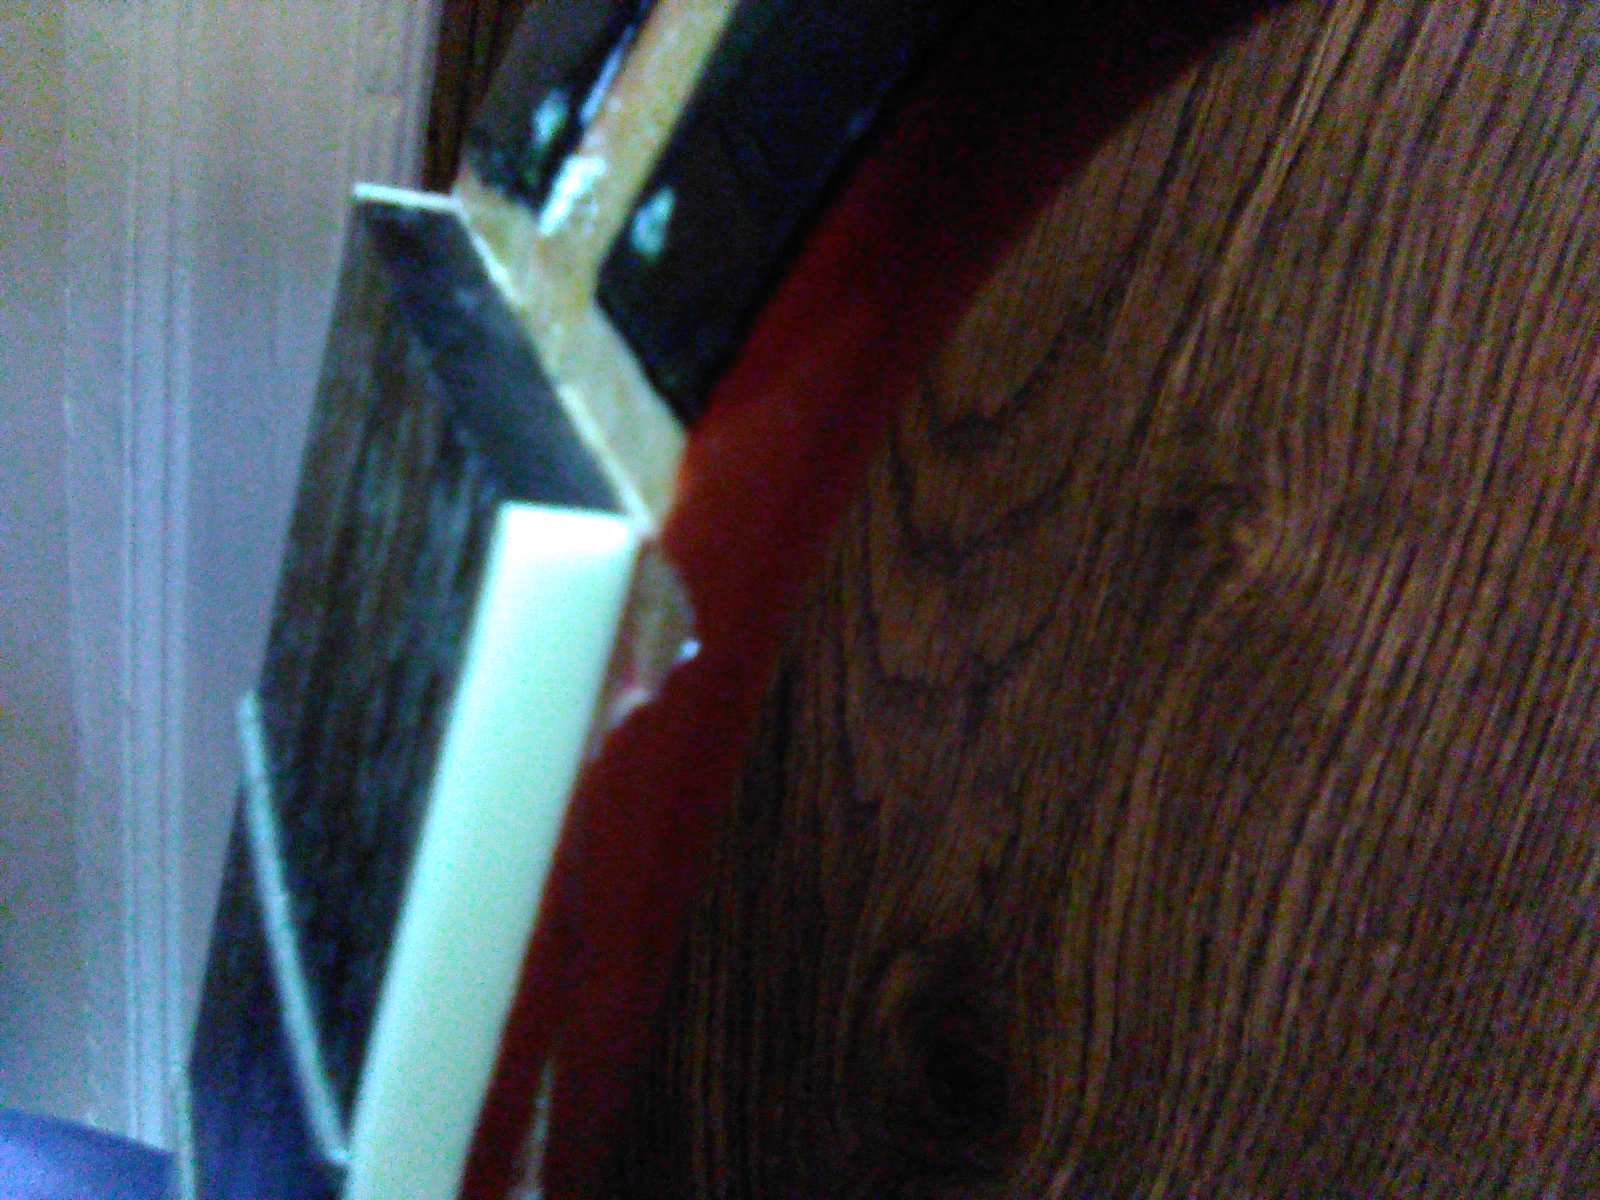 Respraying finish cracks in beater guitar-neck7-jpg